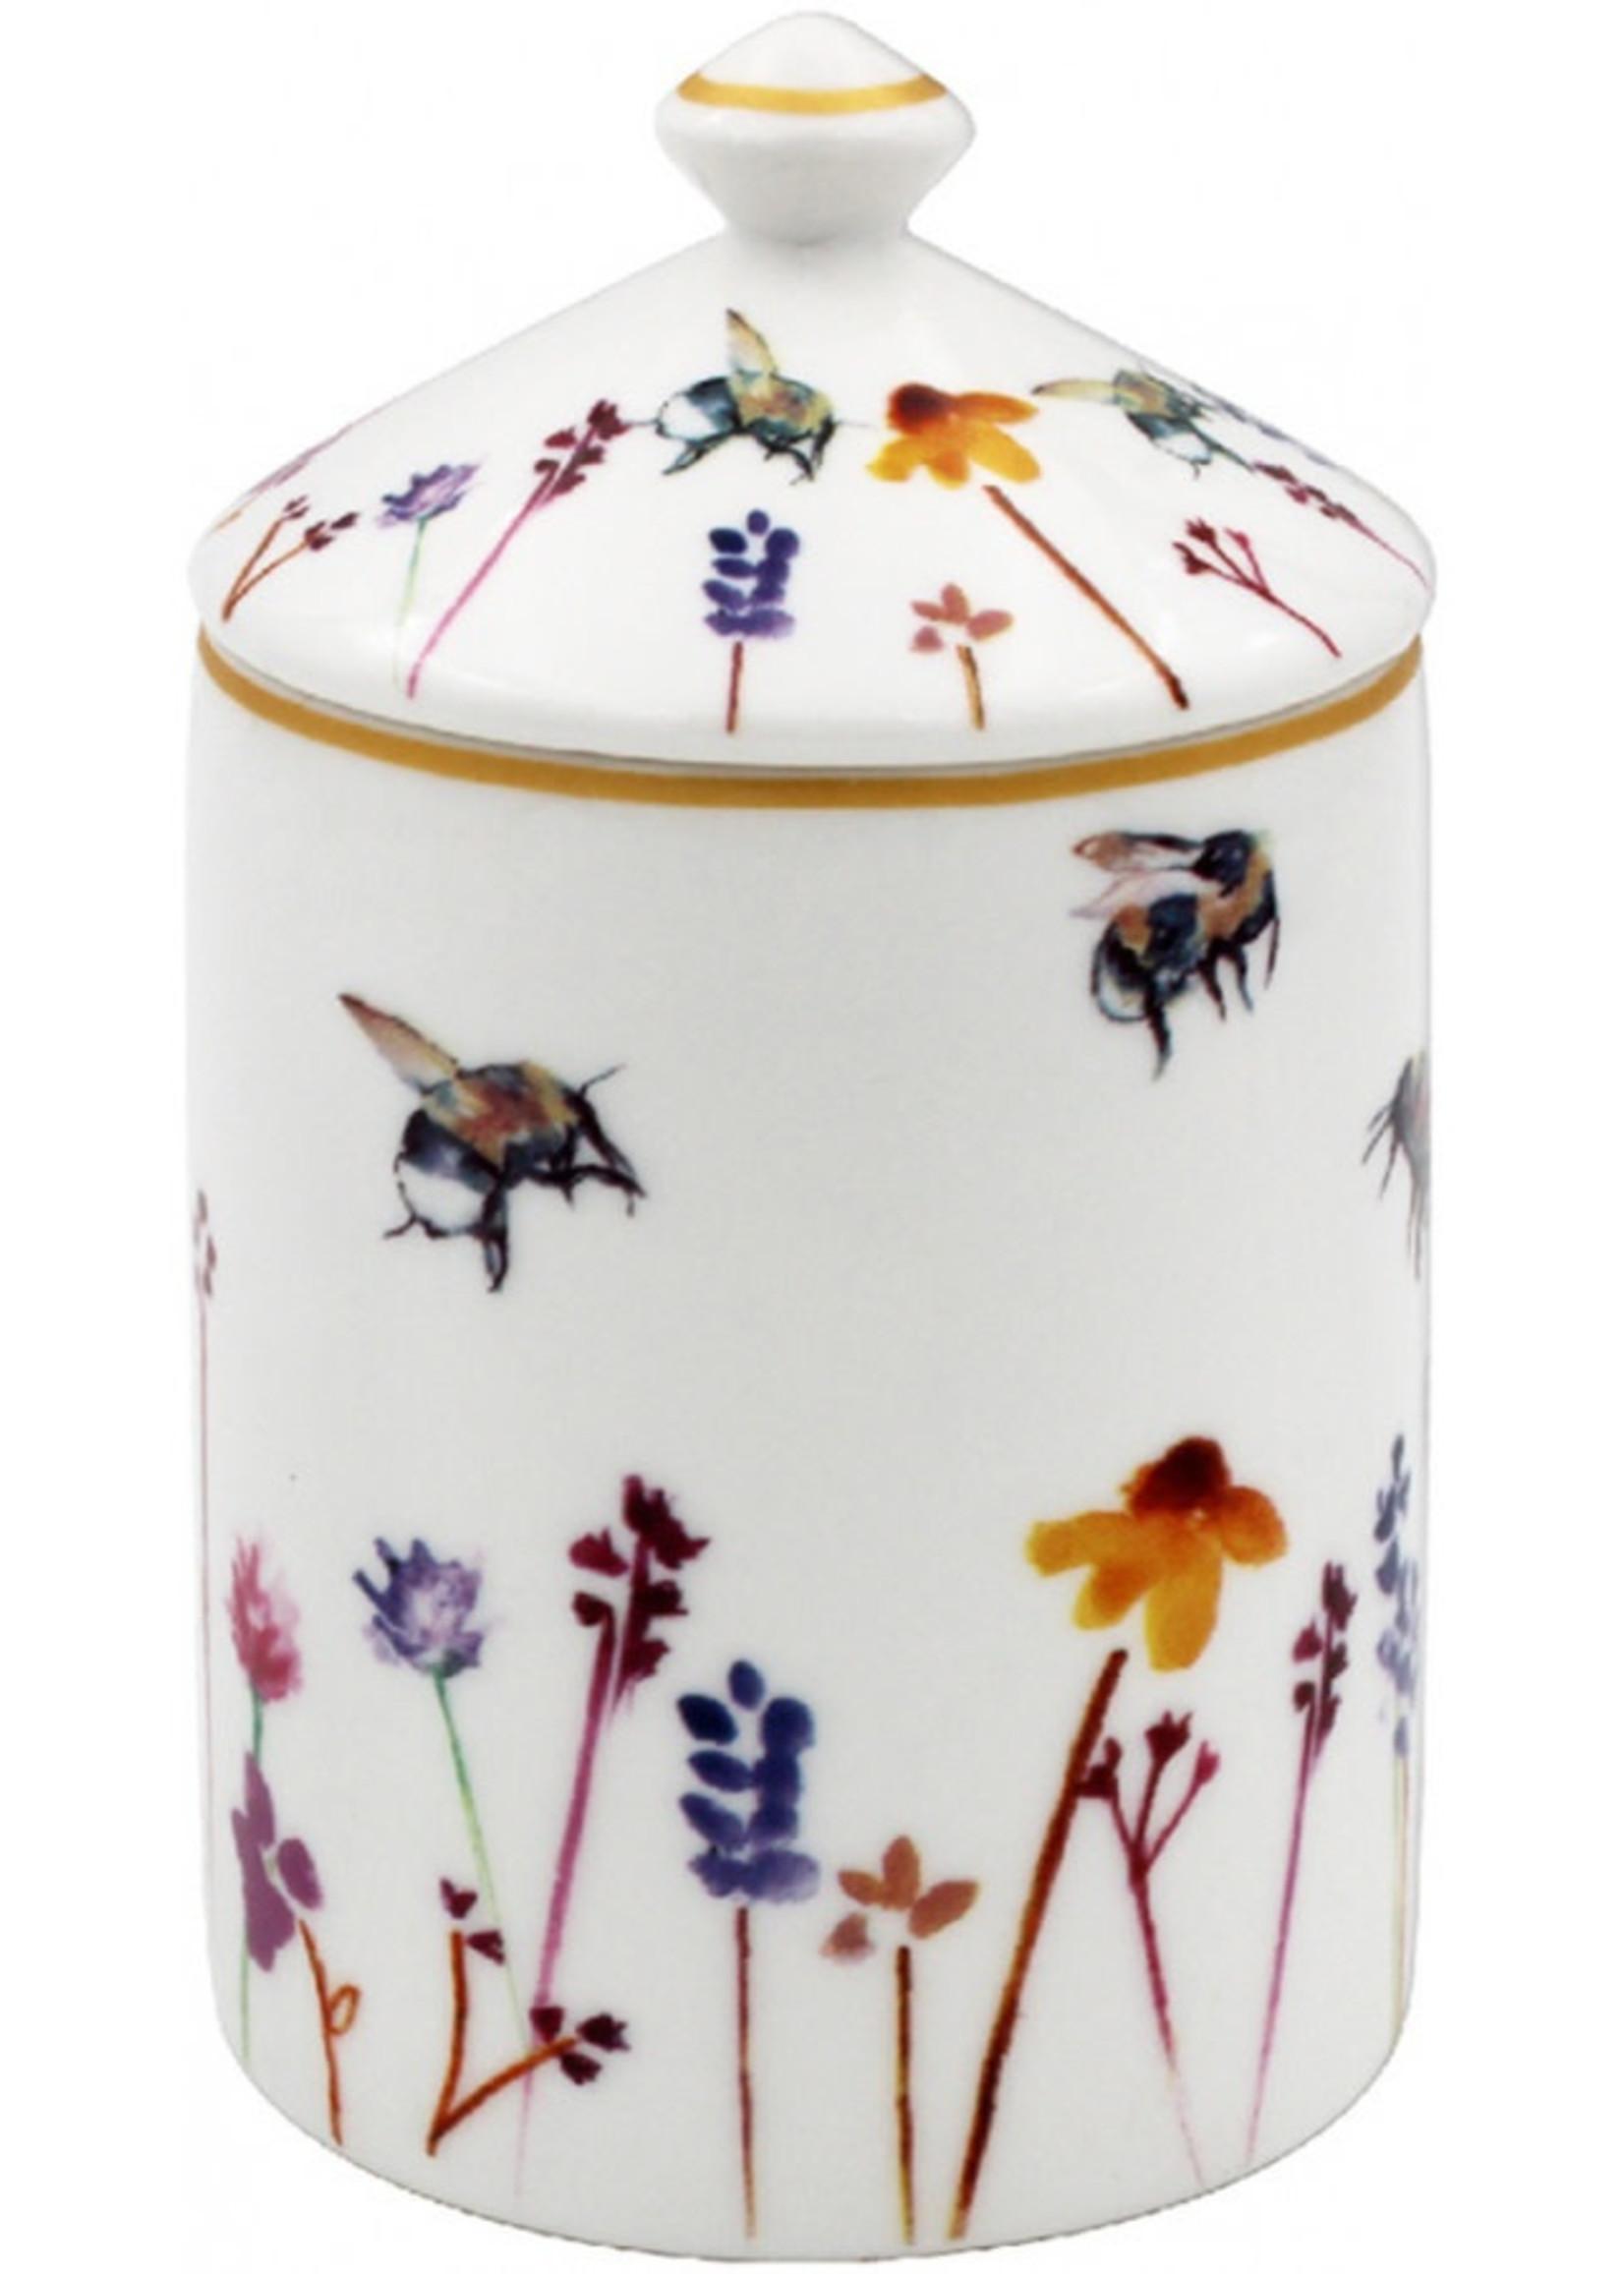 Busy Bee Garden Candle Jar